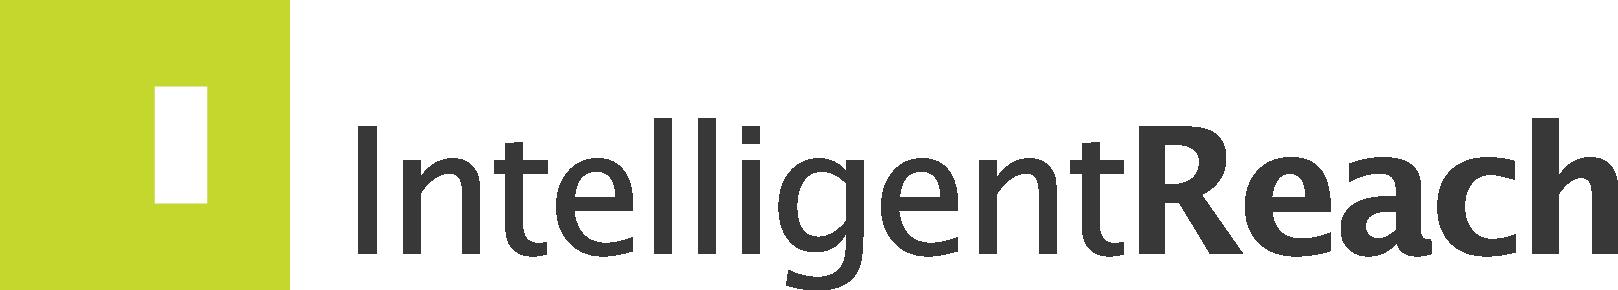 IntelligentReach_Logo-1.png